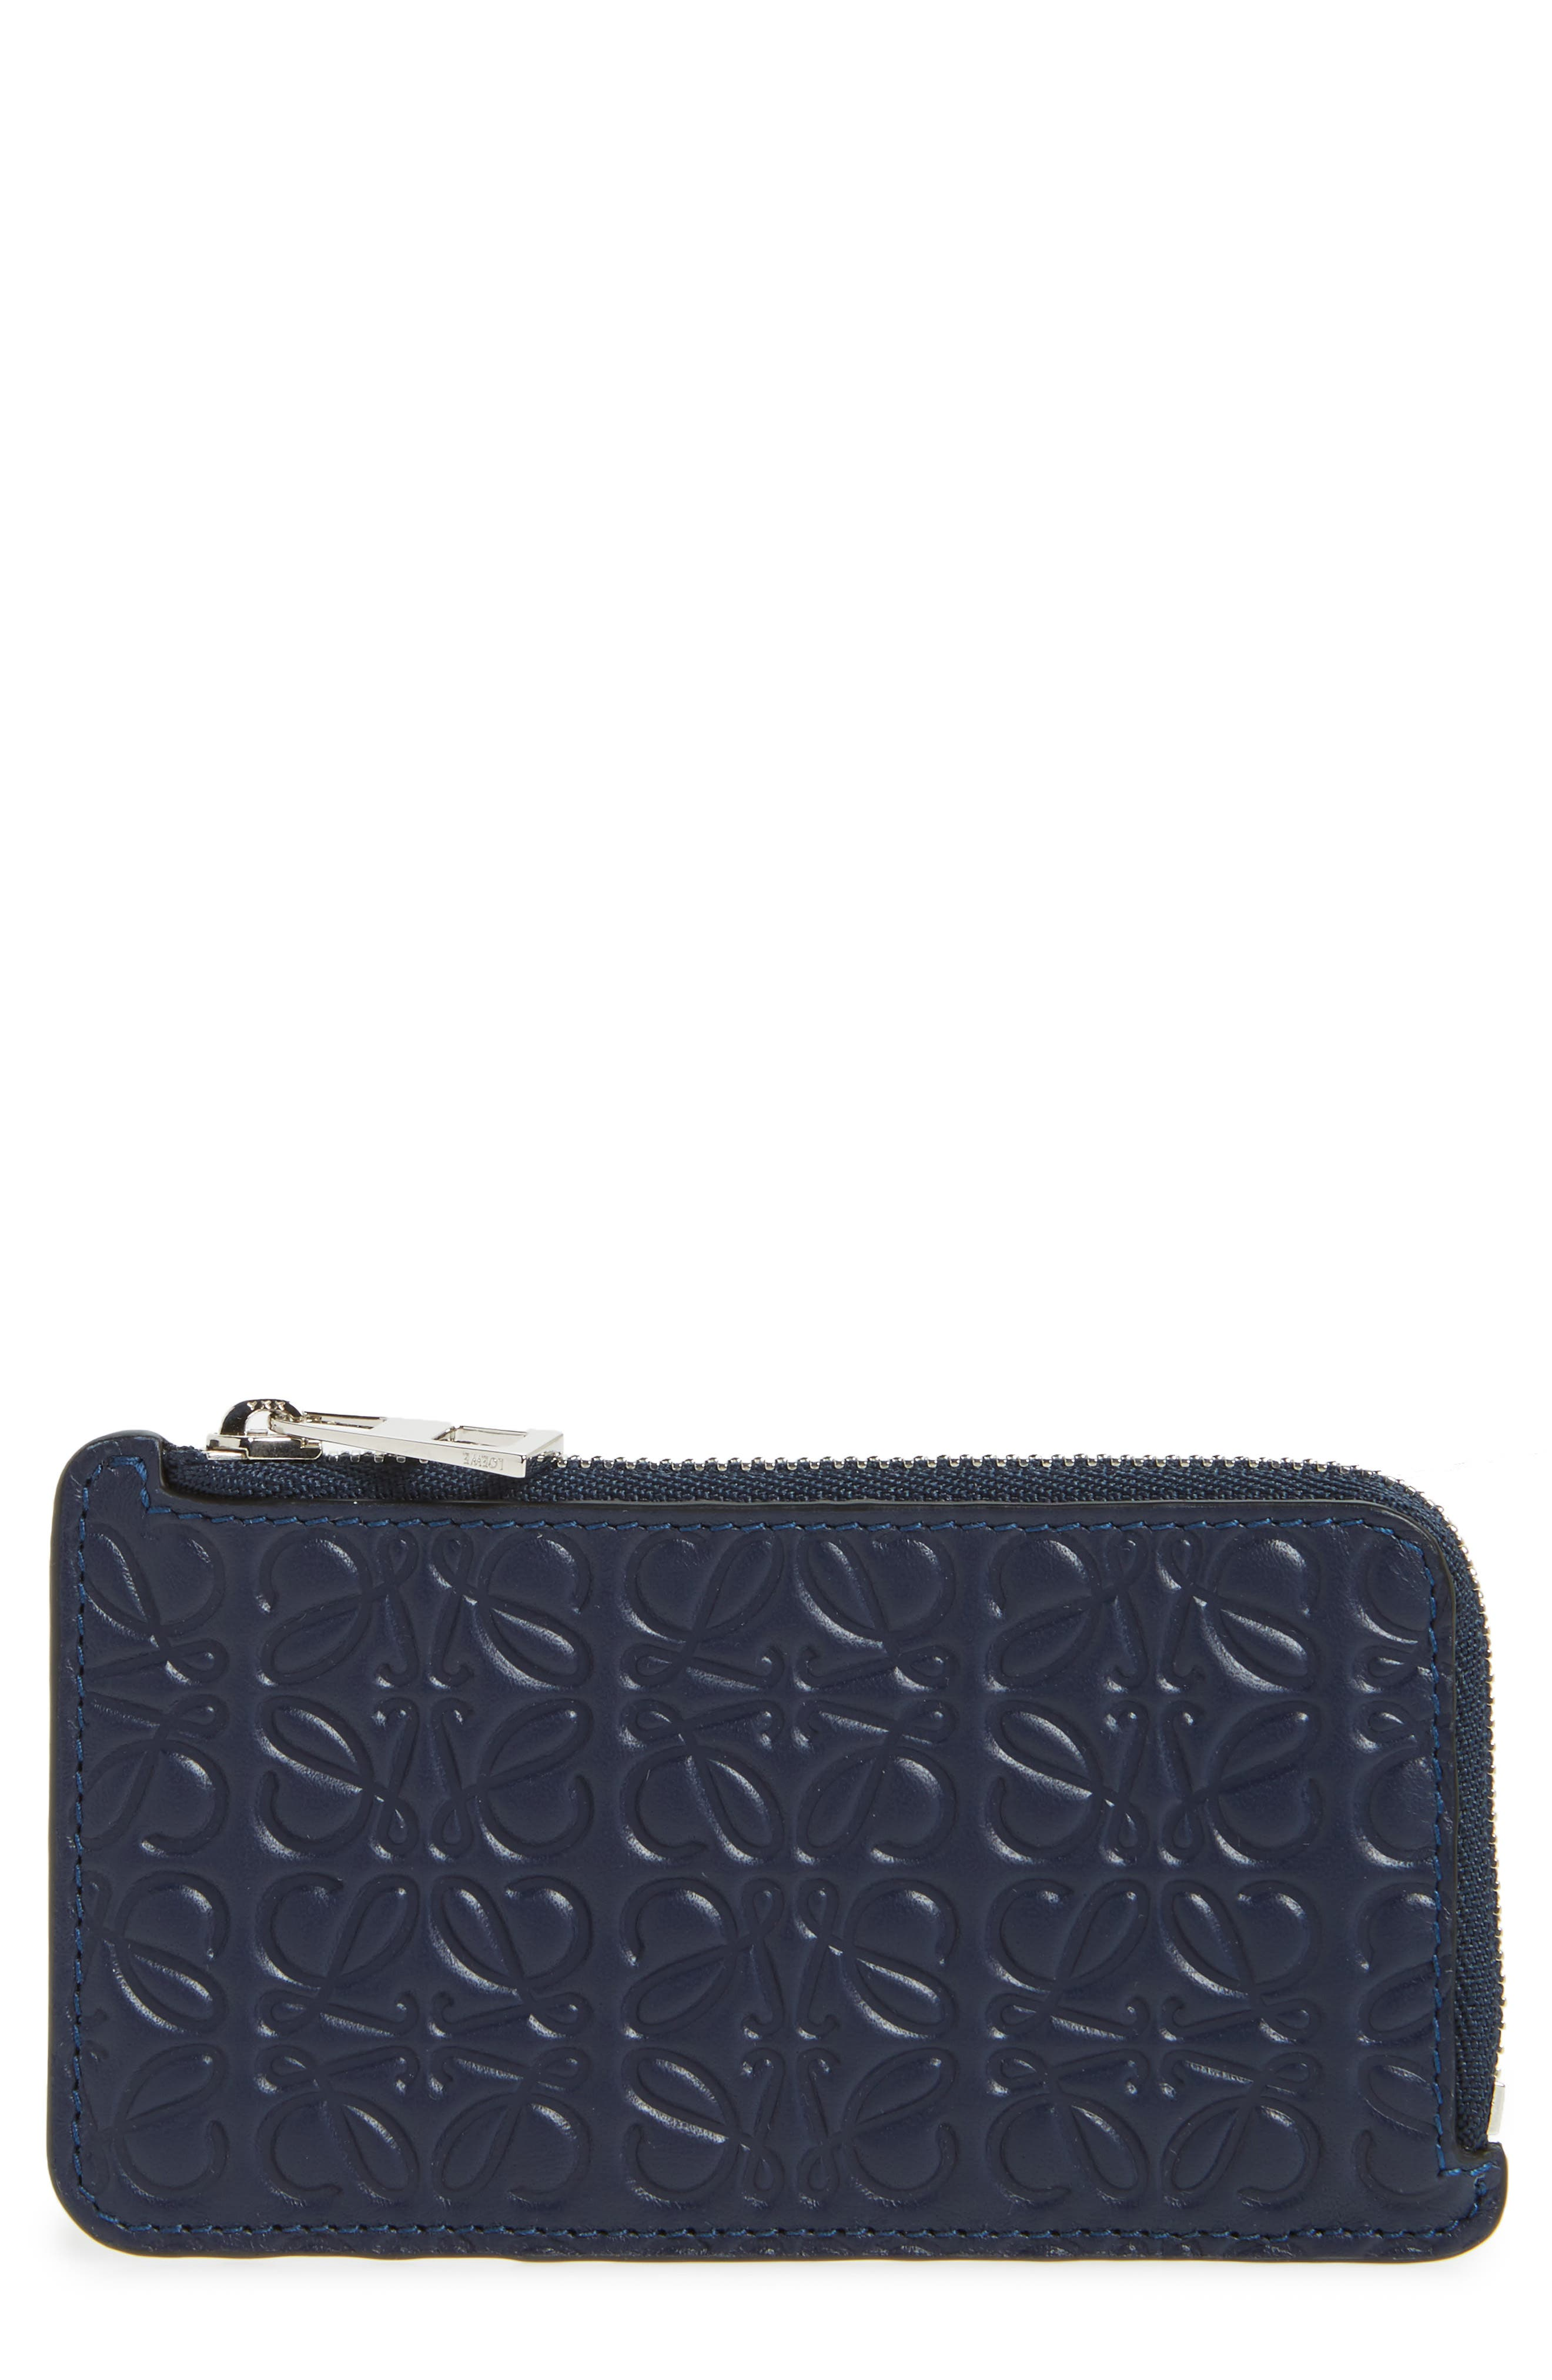 Coin & Card Zip Pouch,                             Main thumbnail 1, color,                             NAVY BLUE